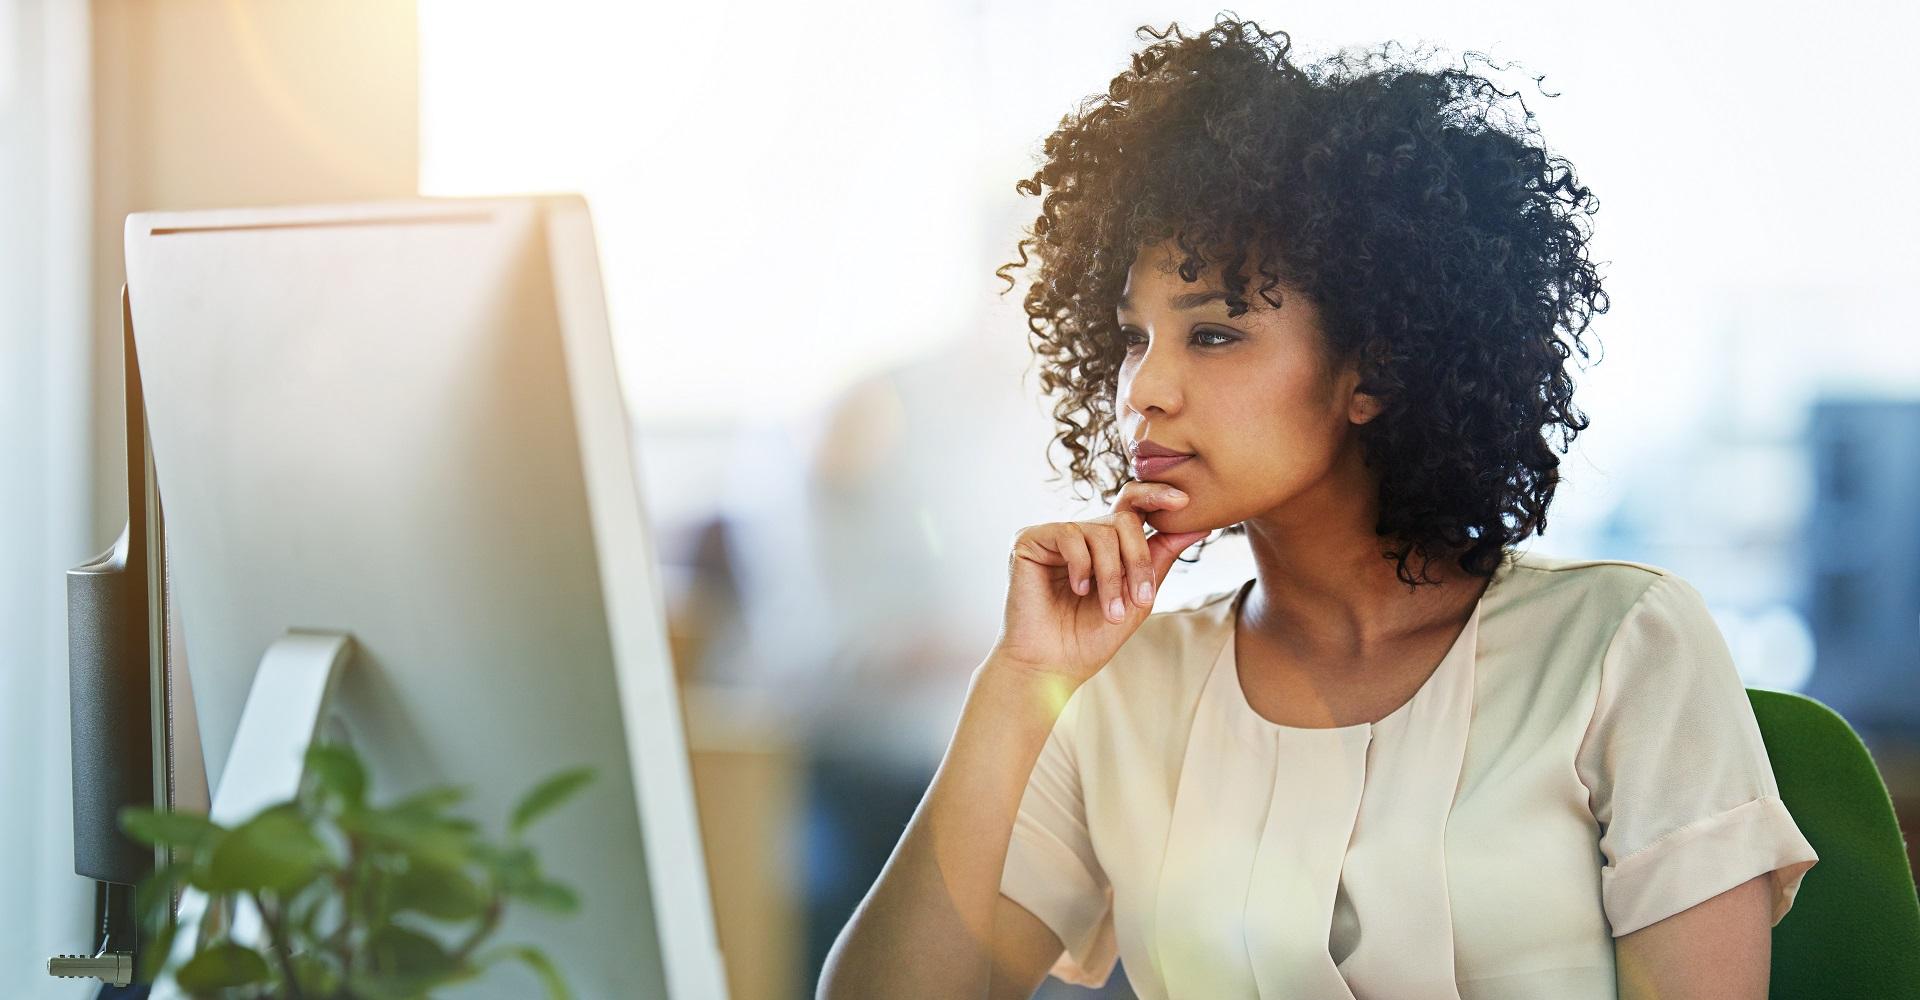 Junge Frau kopiert einen Ordner in Google Drive